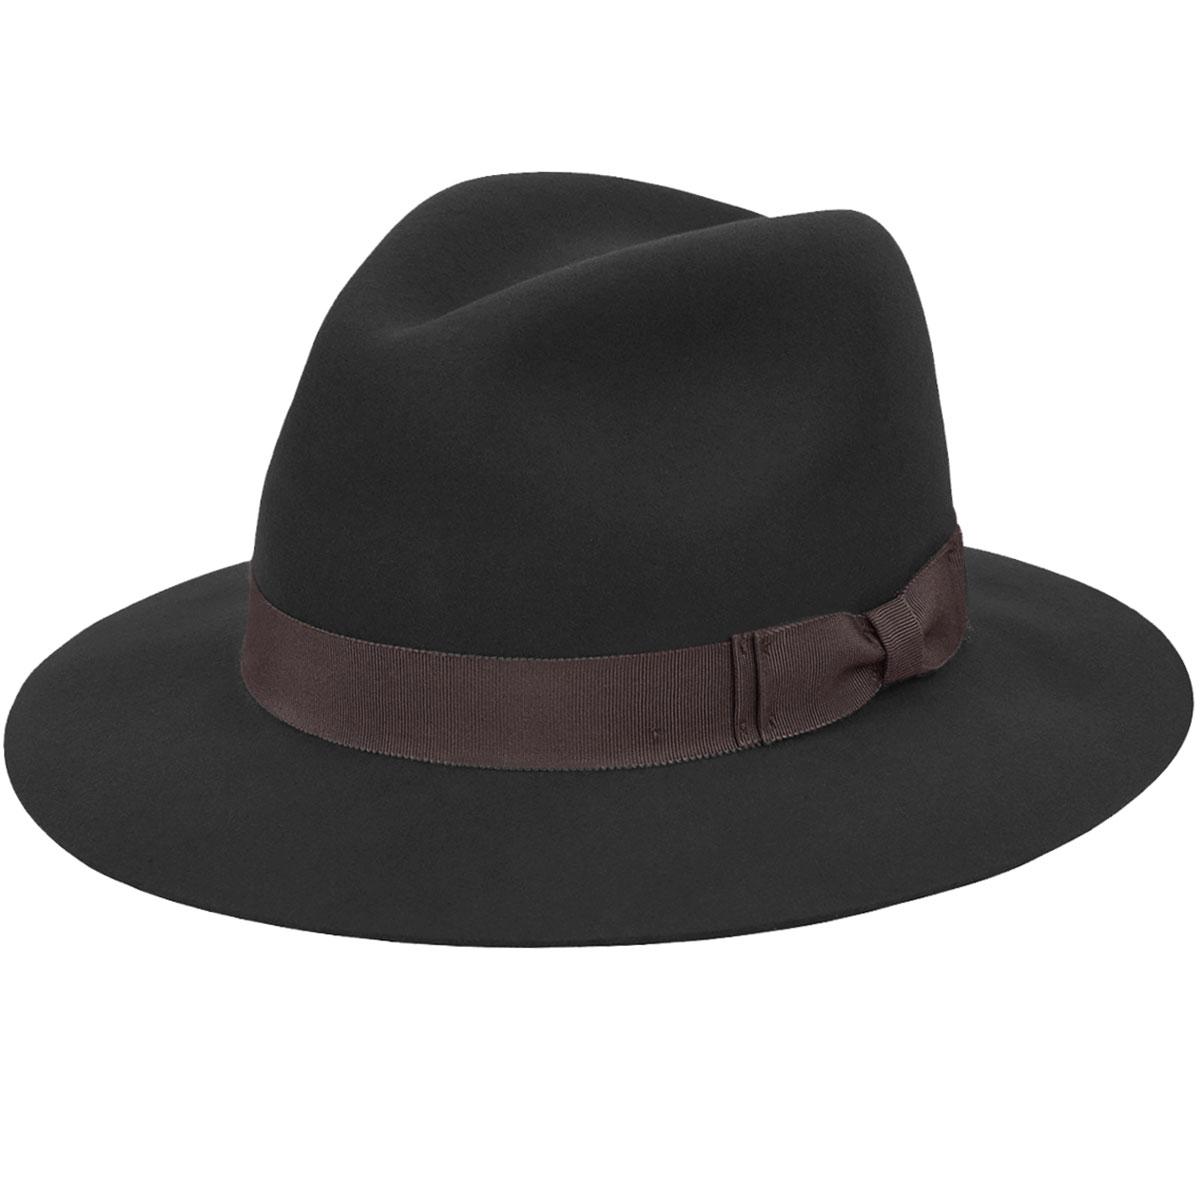 Pantropic Hunter LiteFelt Fedora in Black